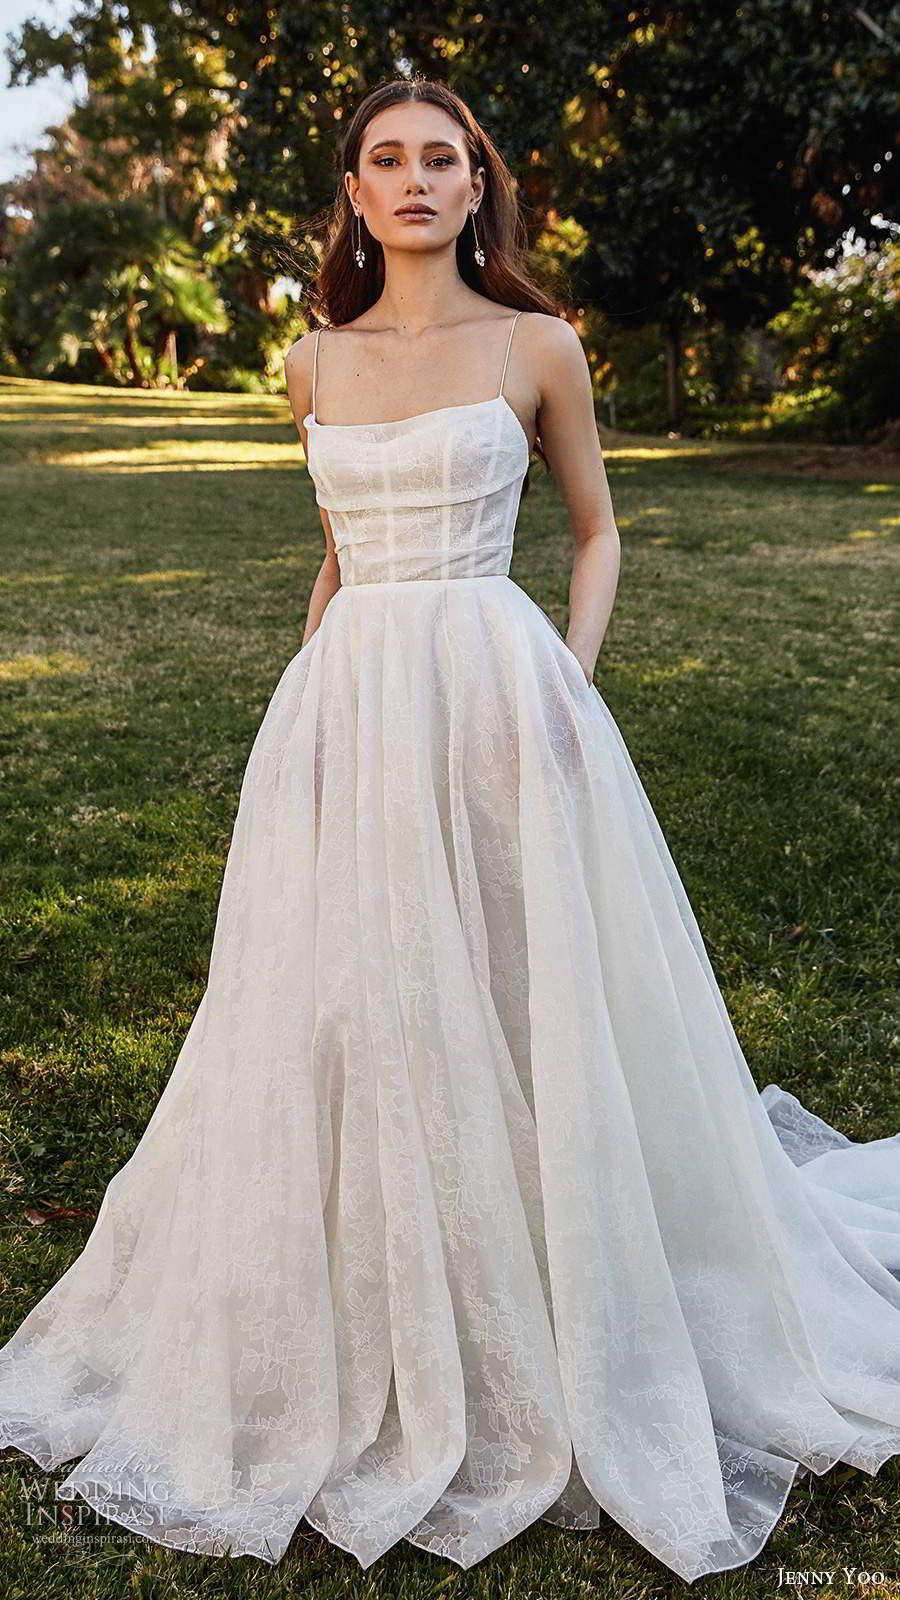 Jenny Yoo Collection Spring 2020 Wedding Dresses | Wedding Inspirasi #weddingdresses